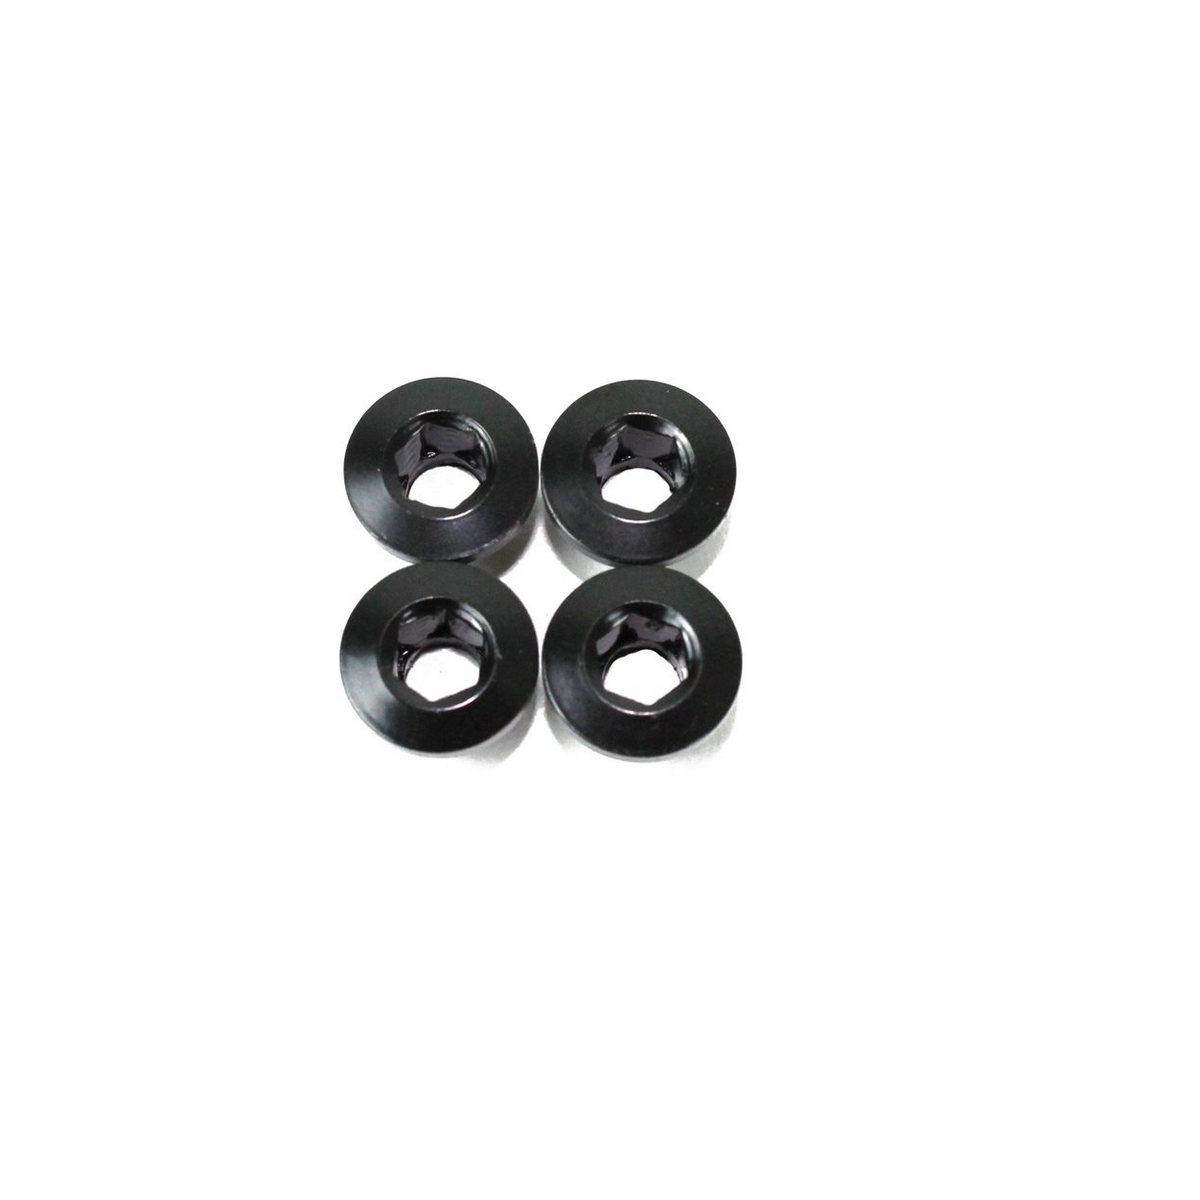 Kit 4pcs screws fixing chainring Pistard Air / Pistard 2.0 black